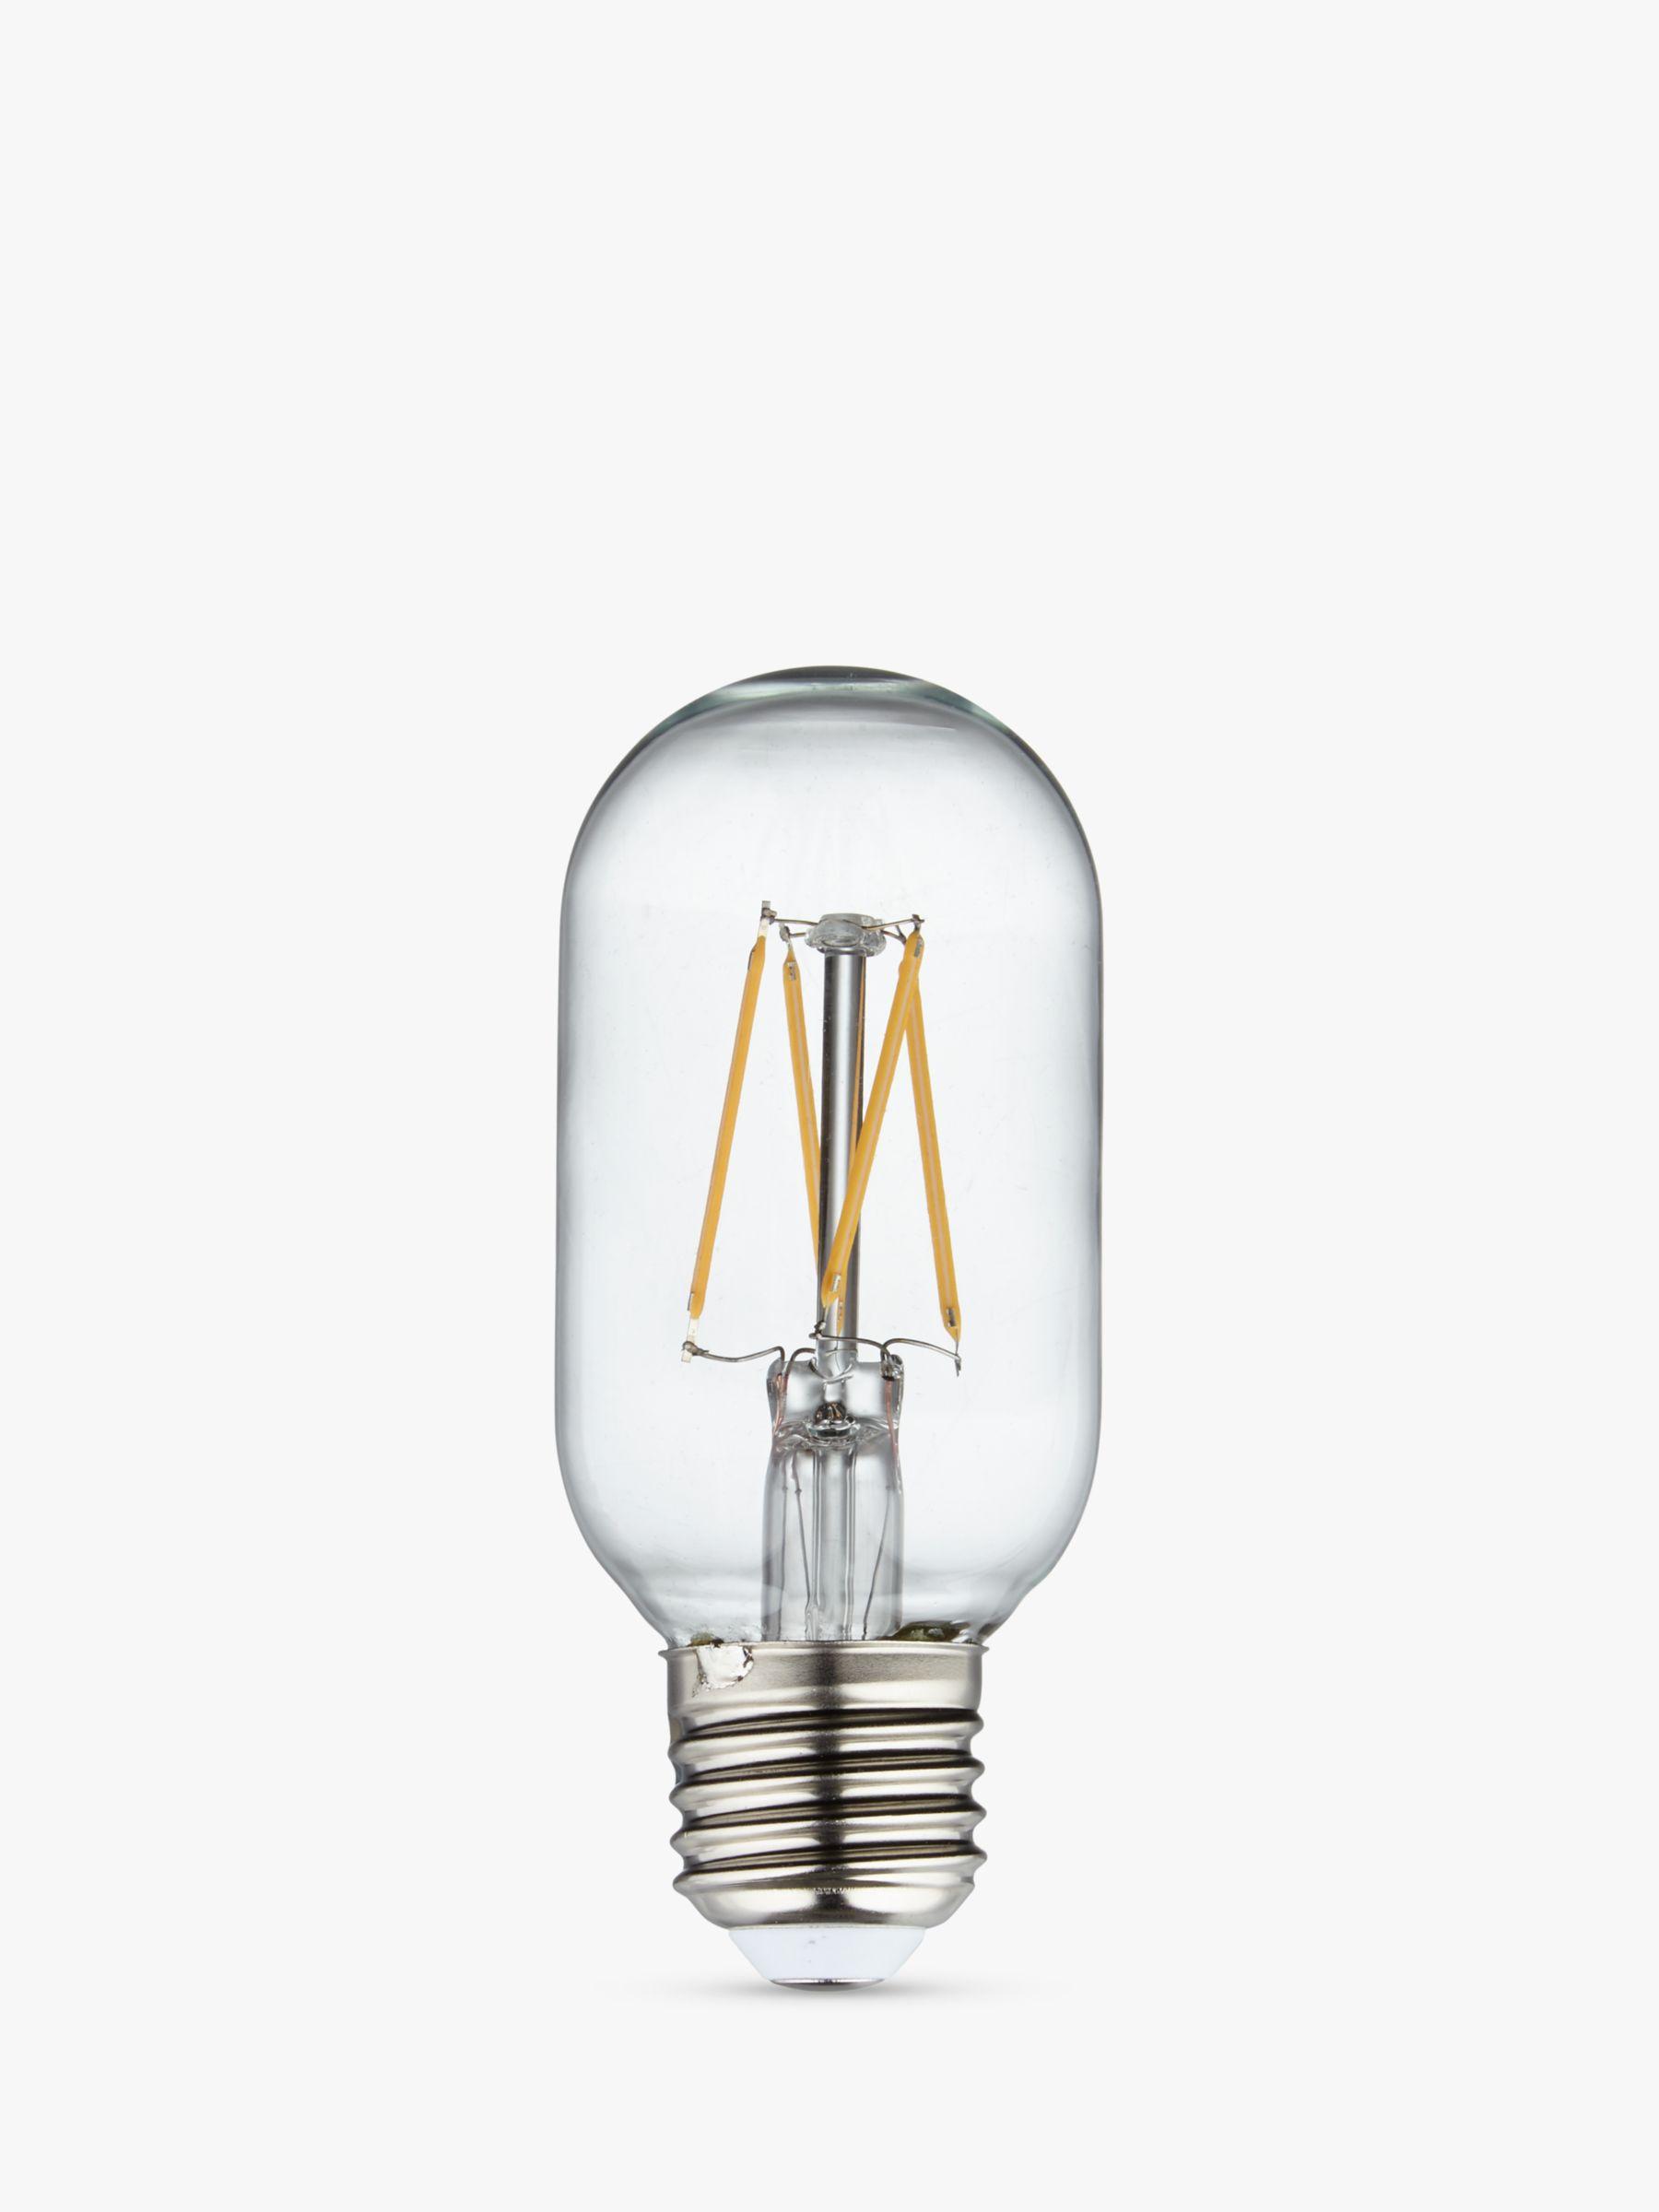 Calex Calex 4W Tube LED Dimmable T45L Filament Bulb, Clear